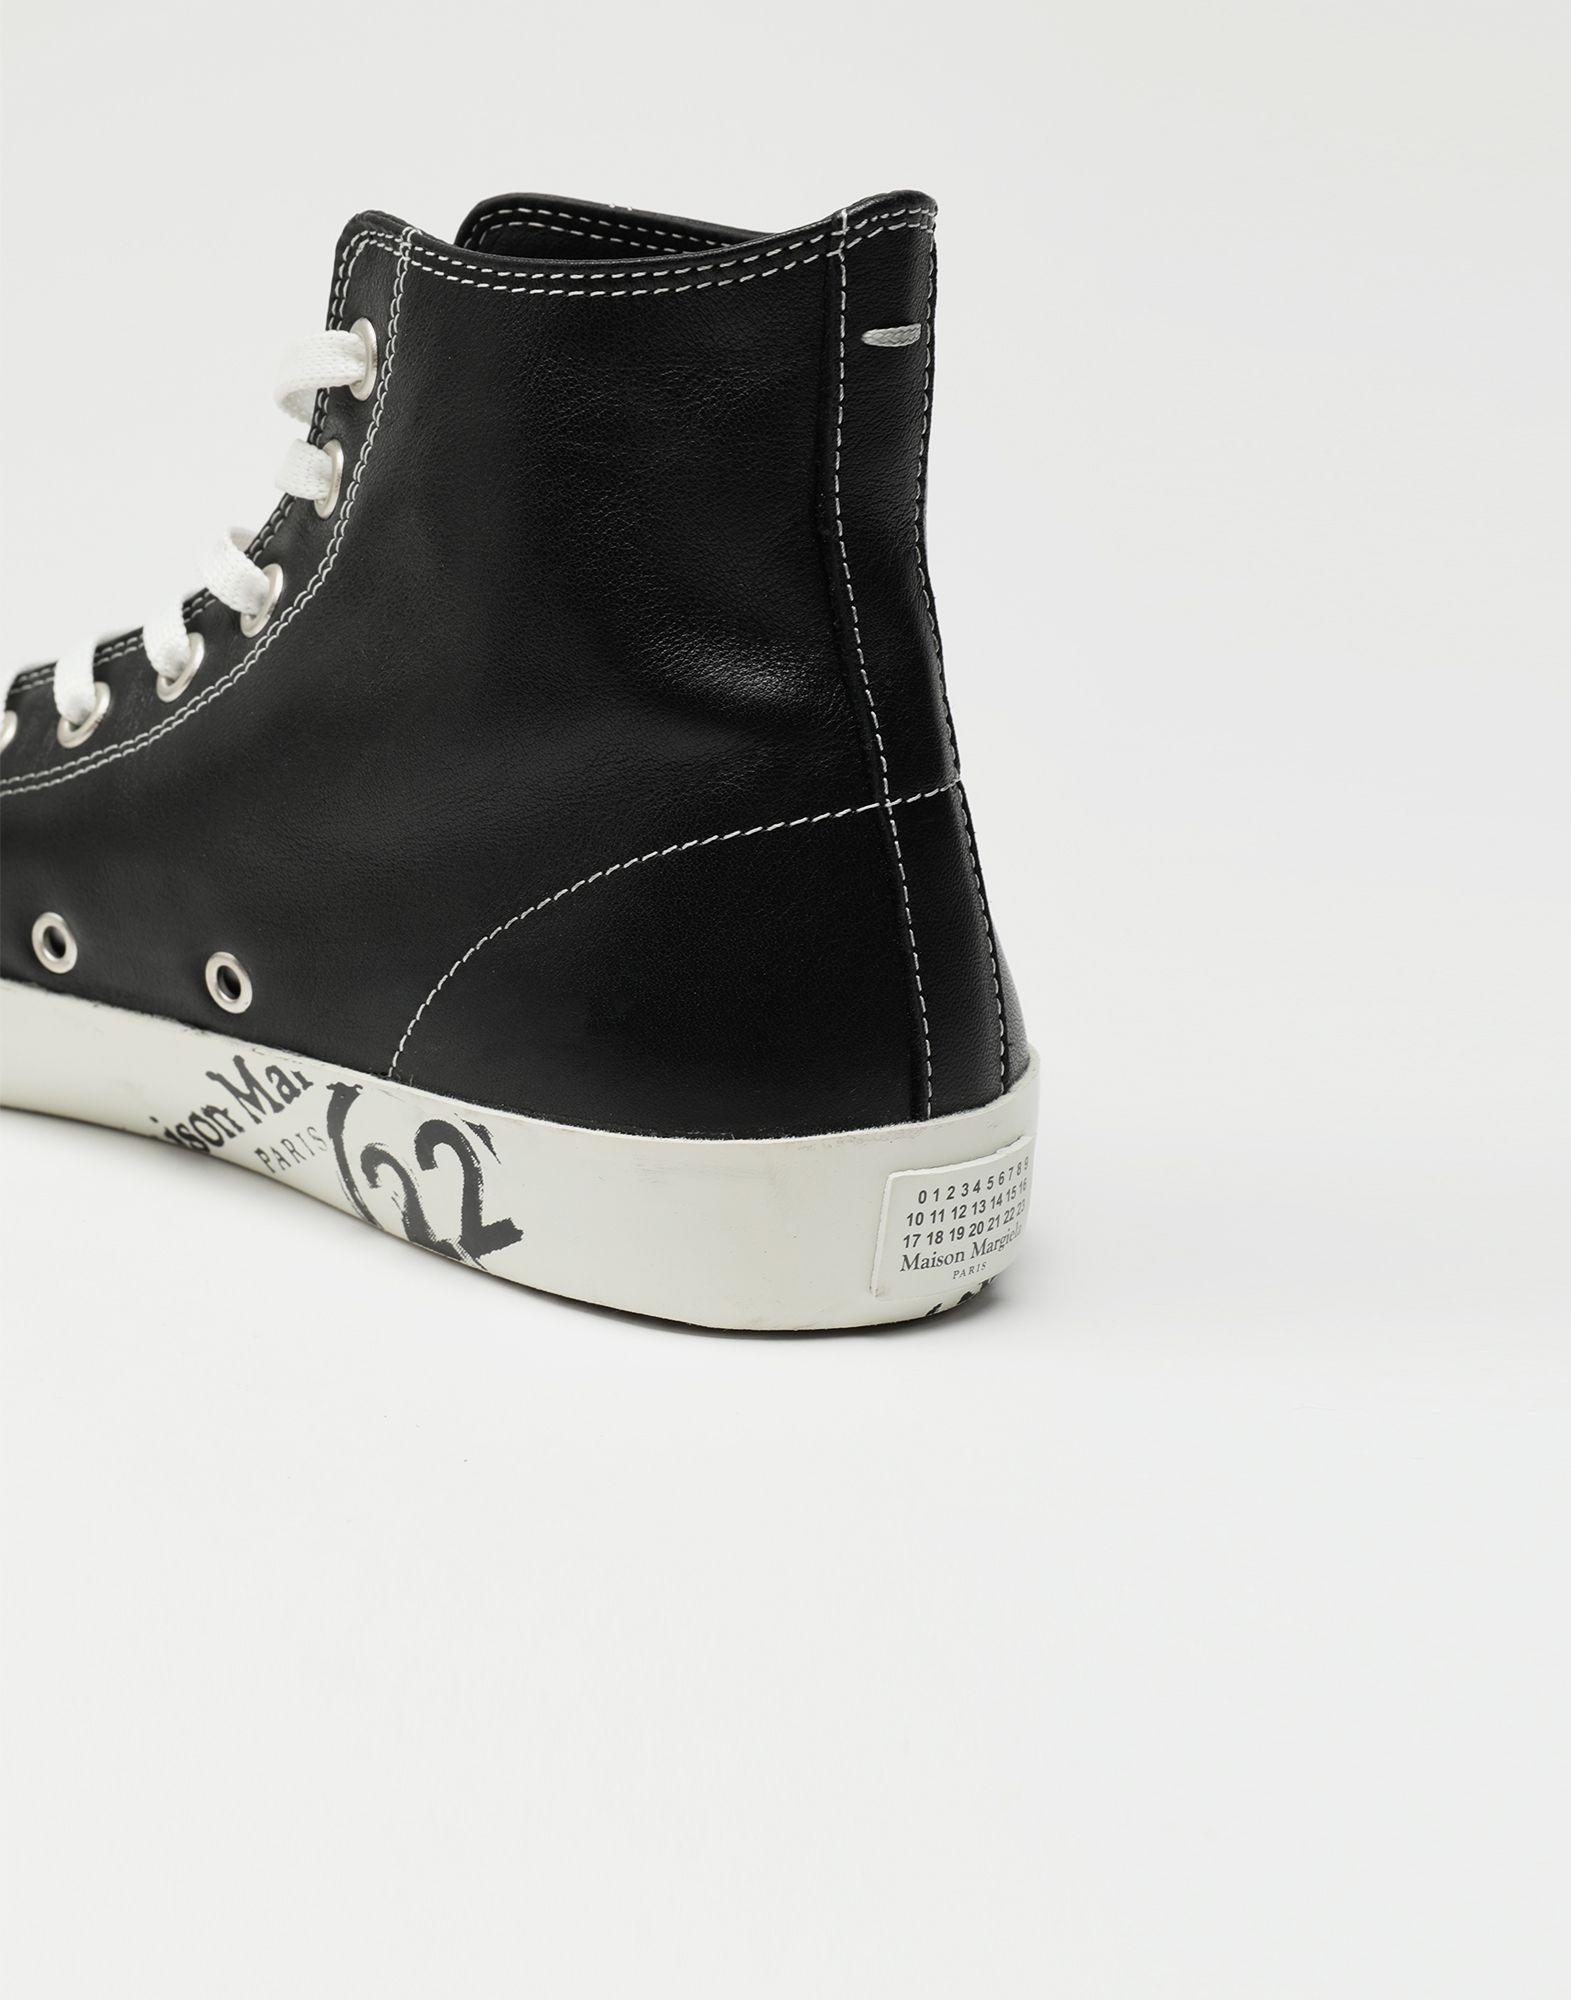 MAISON MARGIELA Tabi high top leather sneakers Sneakers Tabi Man a